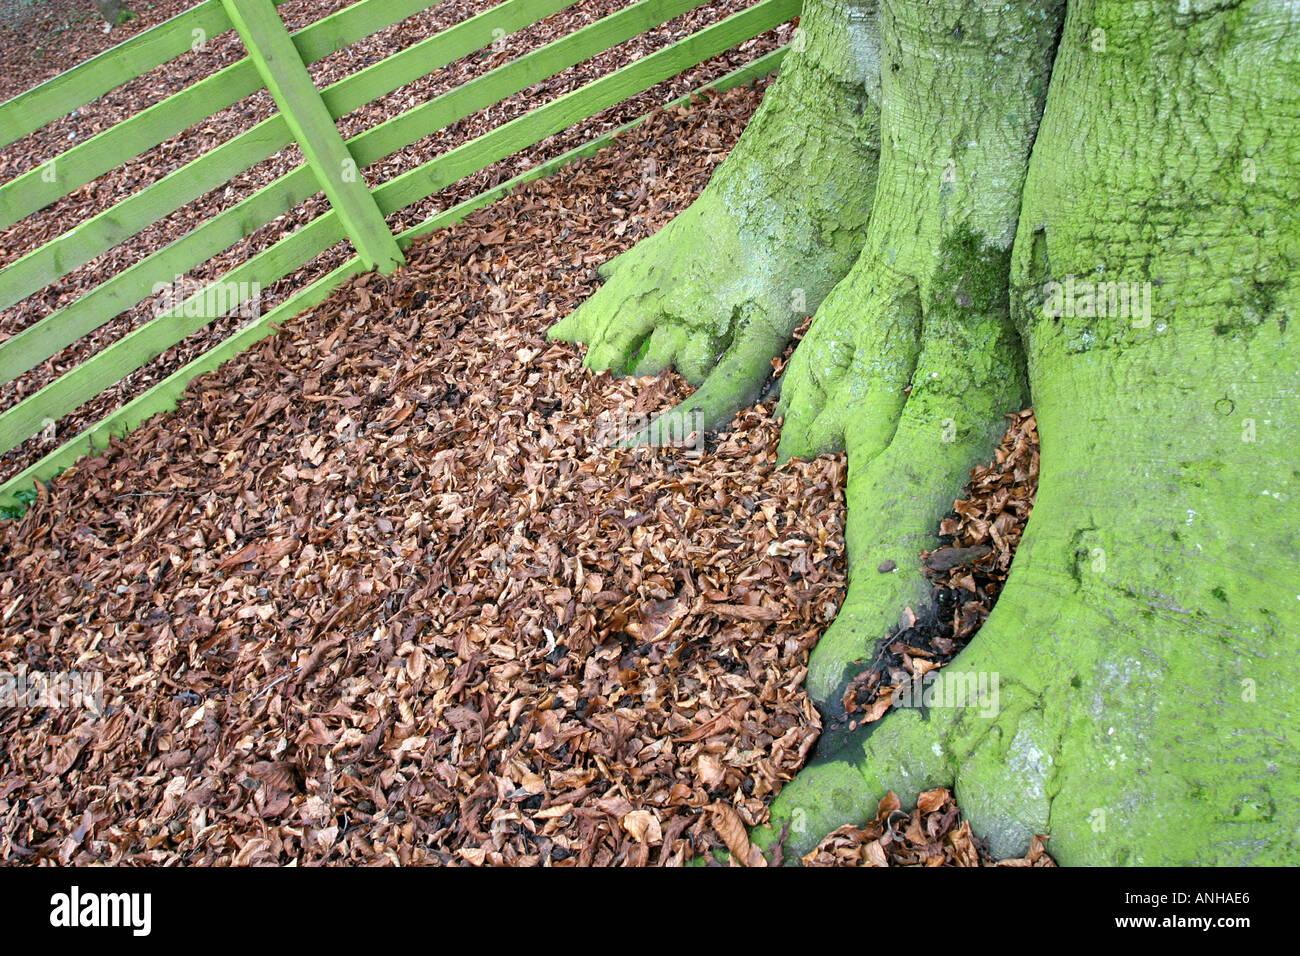 Wes Tree Stockfotos & Wes Tree Bilder Seite 5 Alamy